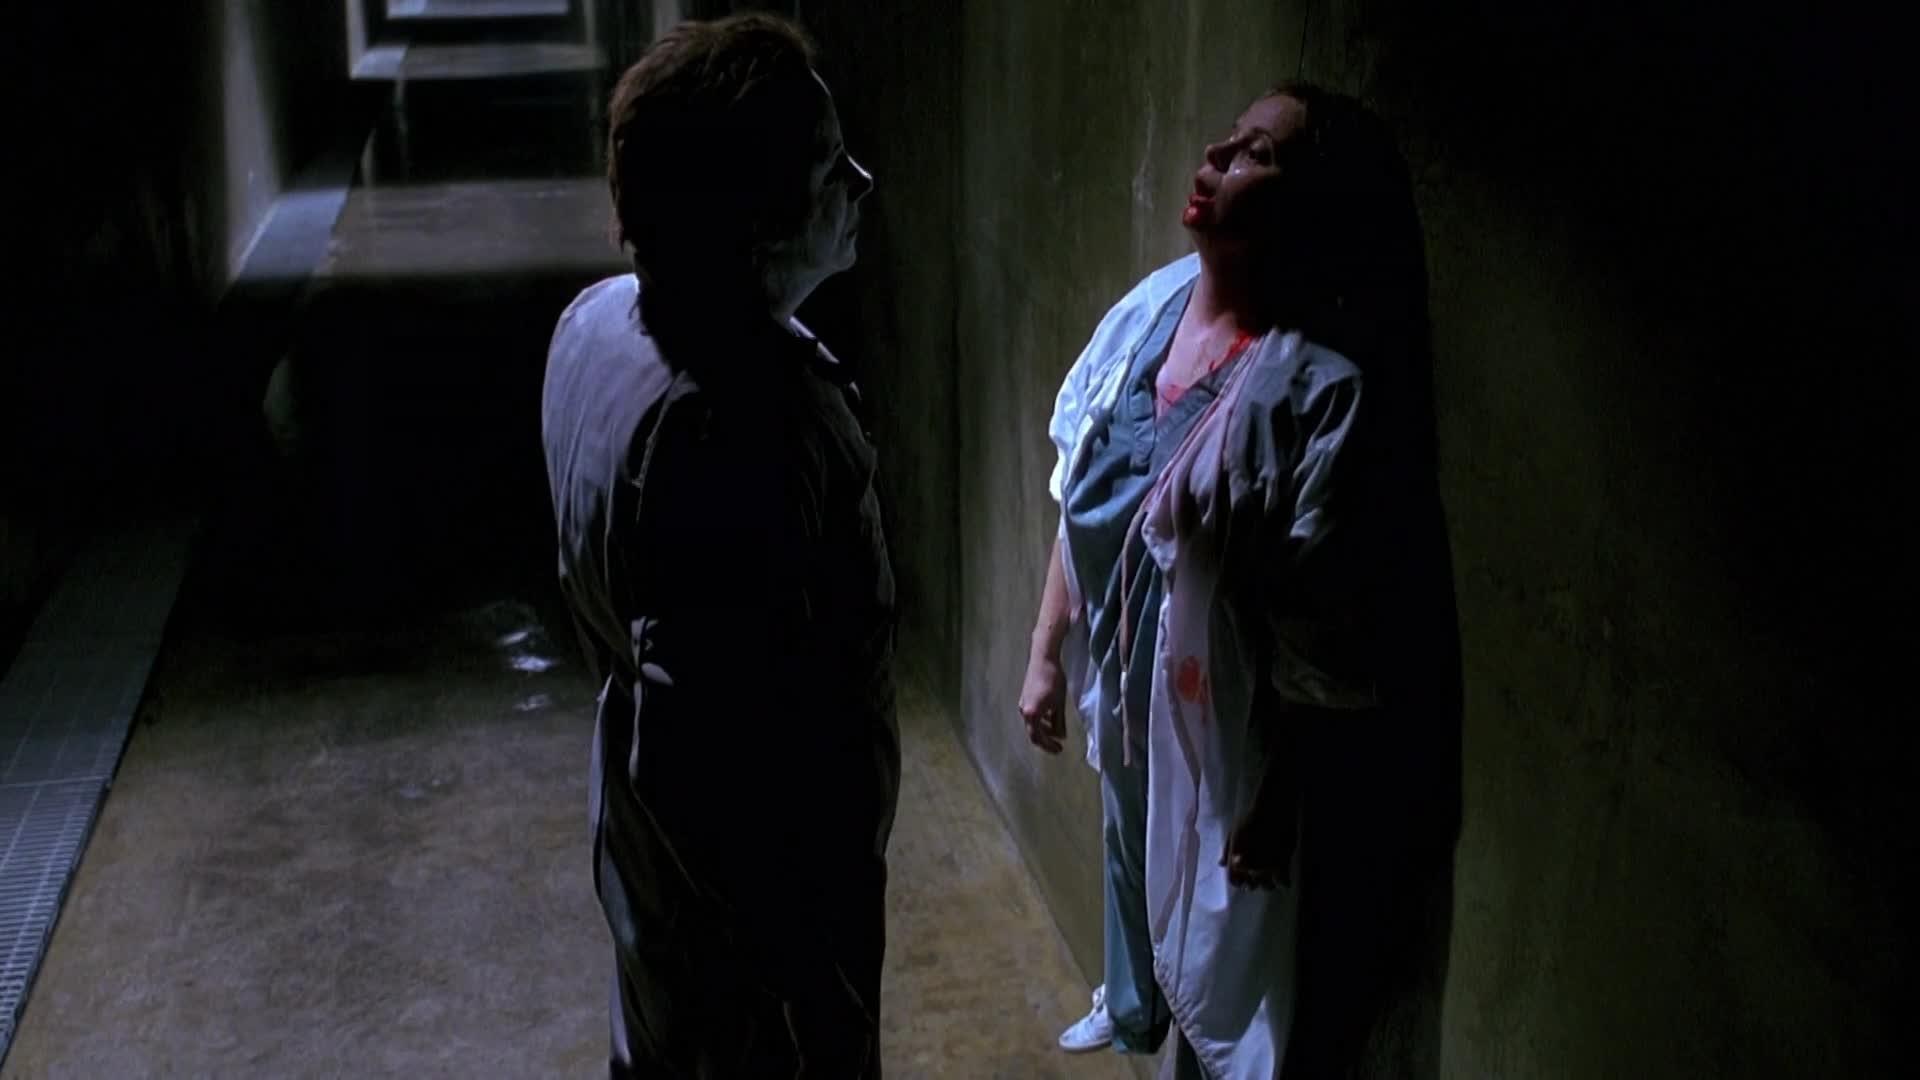 'Halloween 6: The Curse of Michael Myers' Producer's Cut Sneak Peek